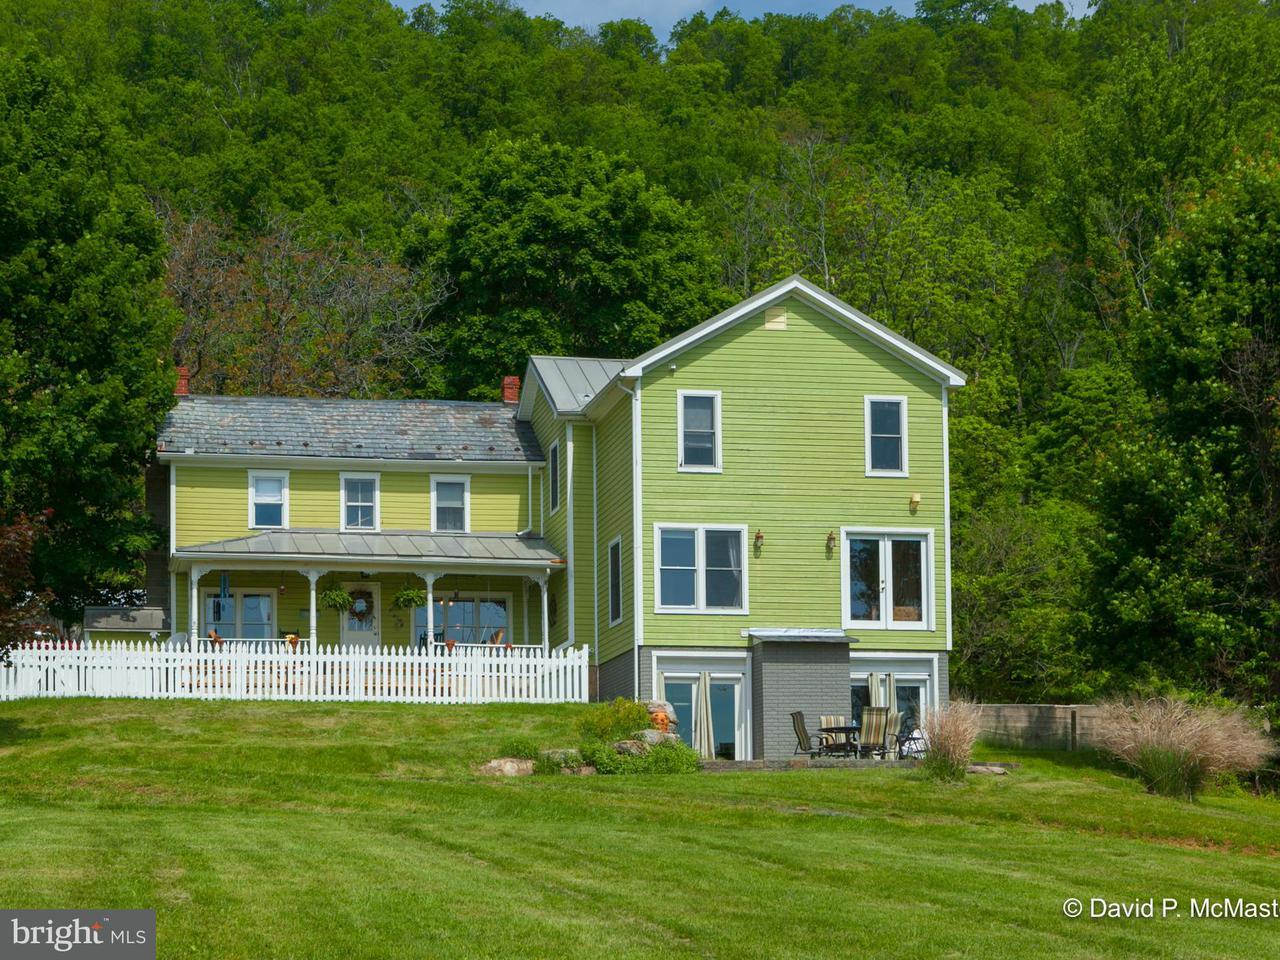 独户住宅 为 销售 在 1973 Needmore Road 1973 Needmore Road Martinsburg, 西弗吉尼亚州 25403 美国